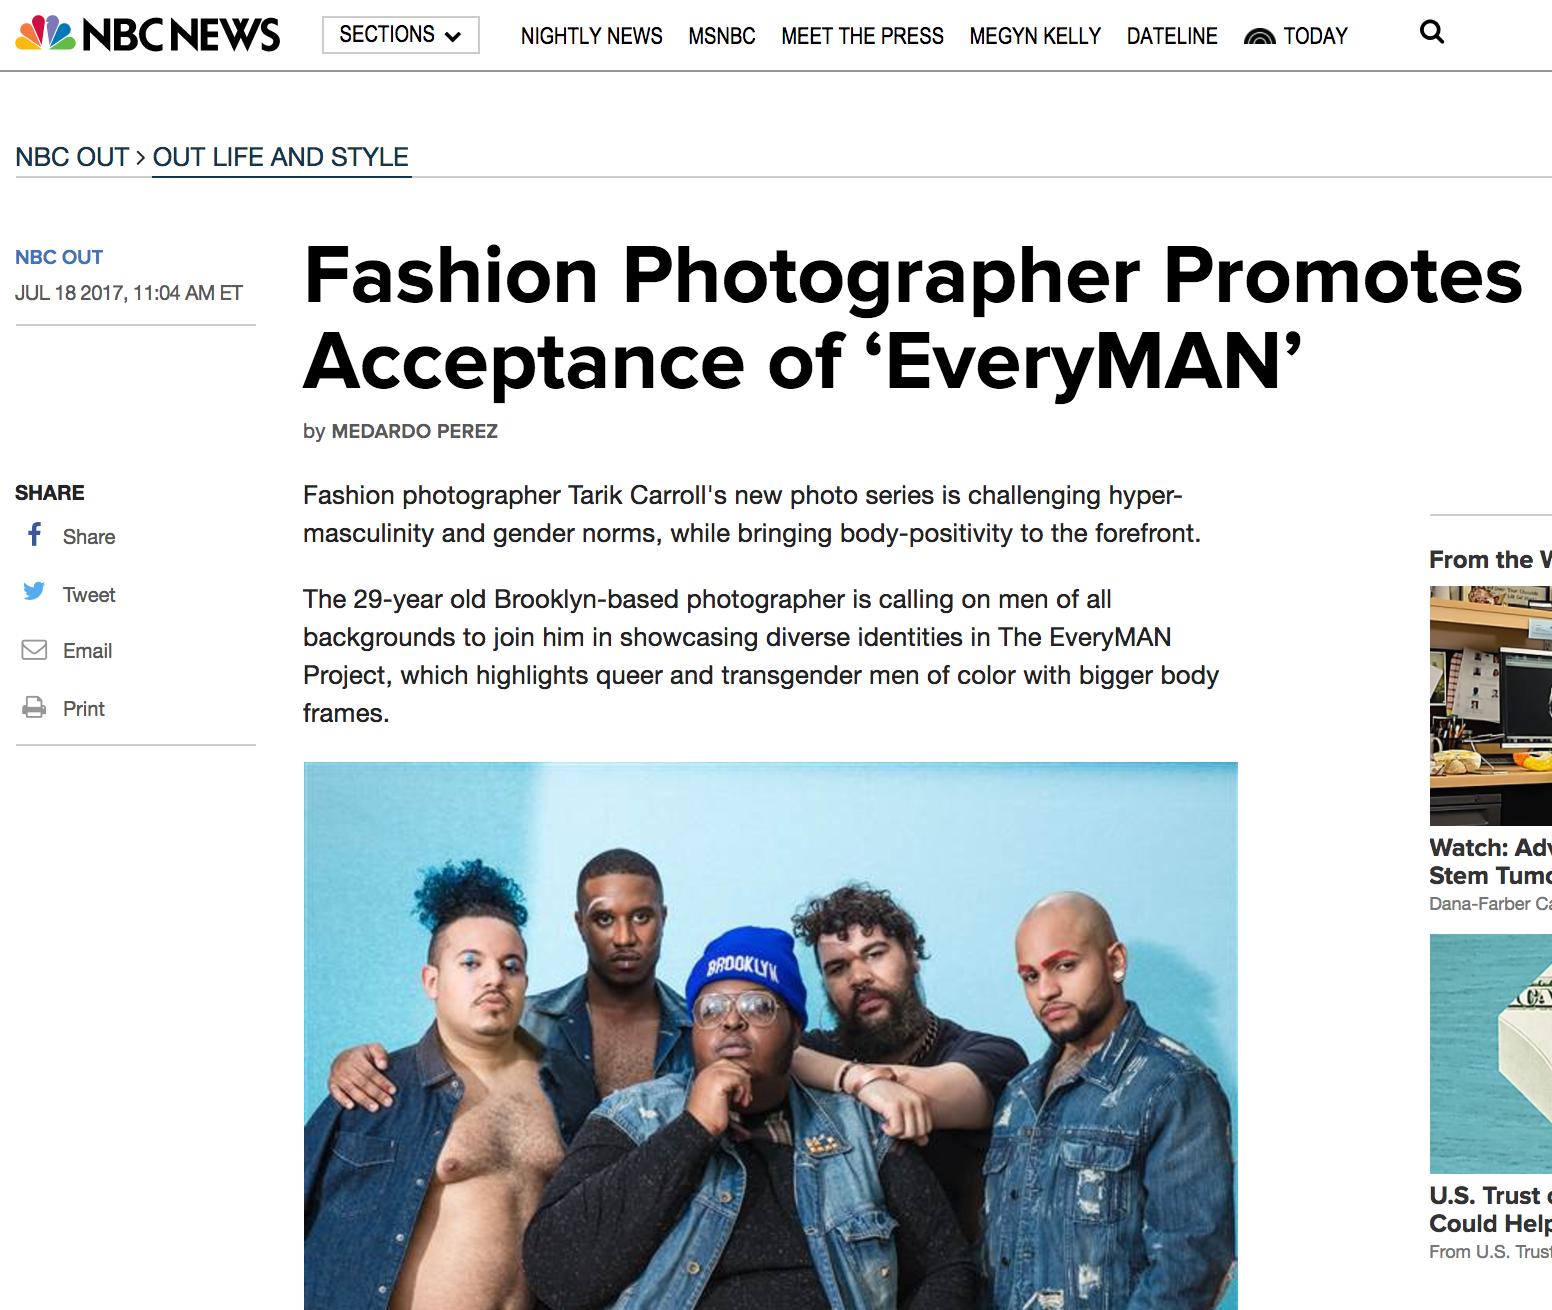 http://www.nbcnews.com/feature/nbc-out/fashion-photographer-promotes-acceptance-everyman-n783881